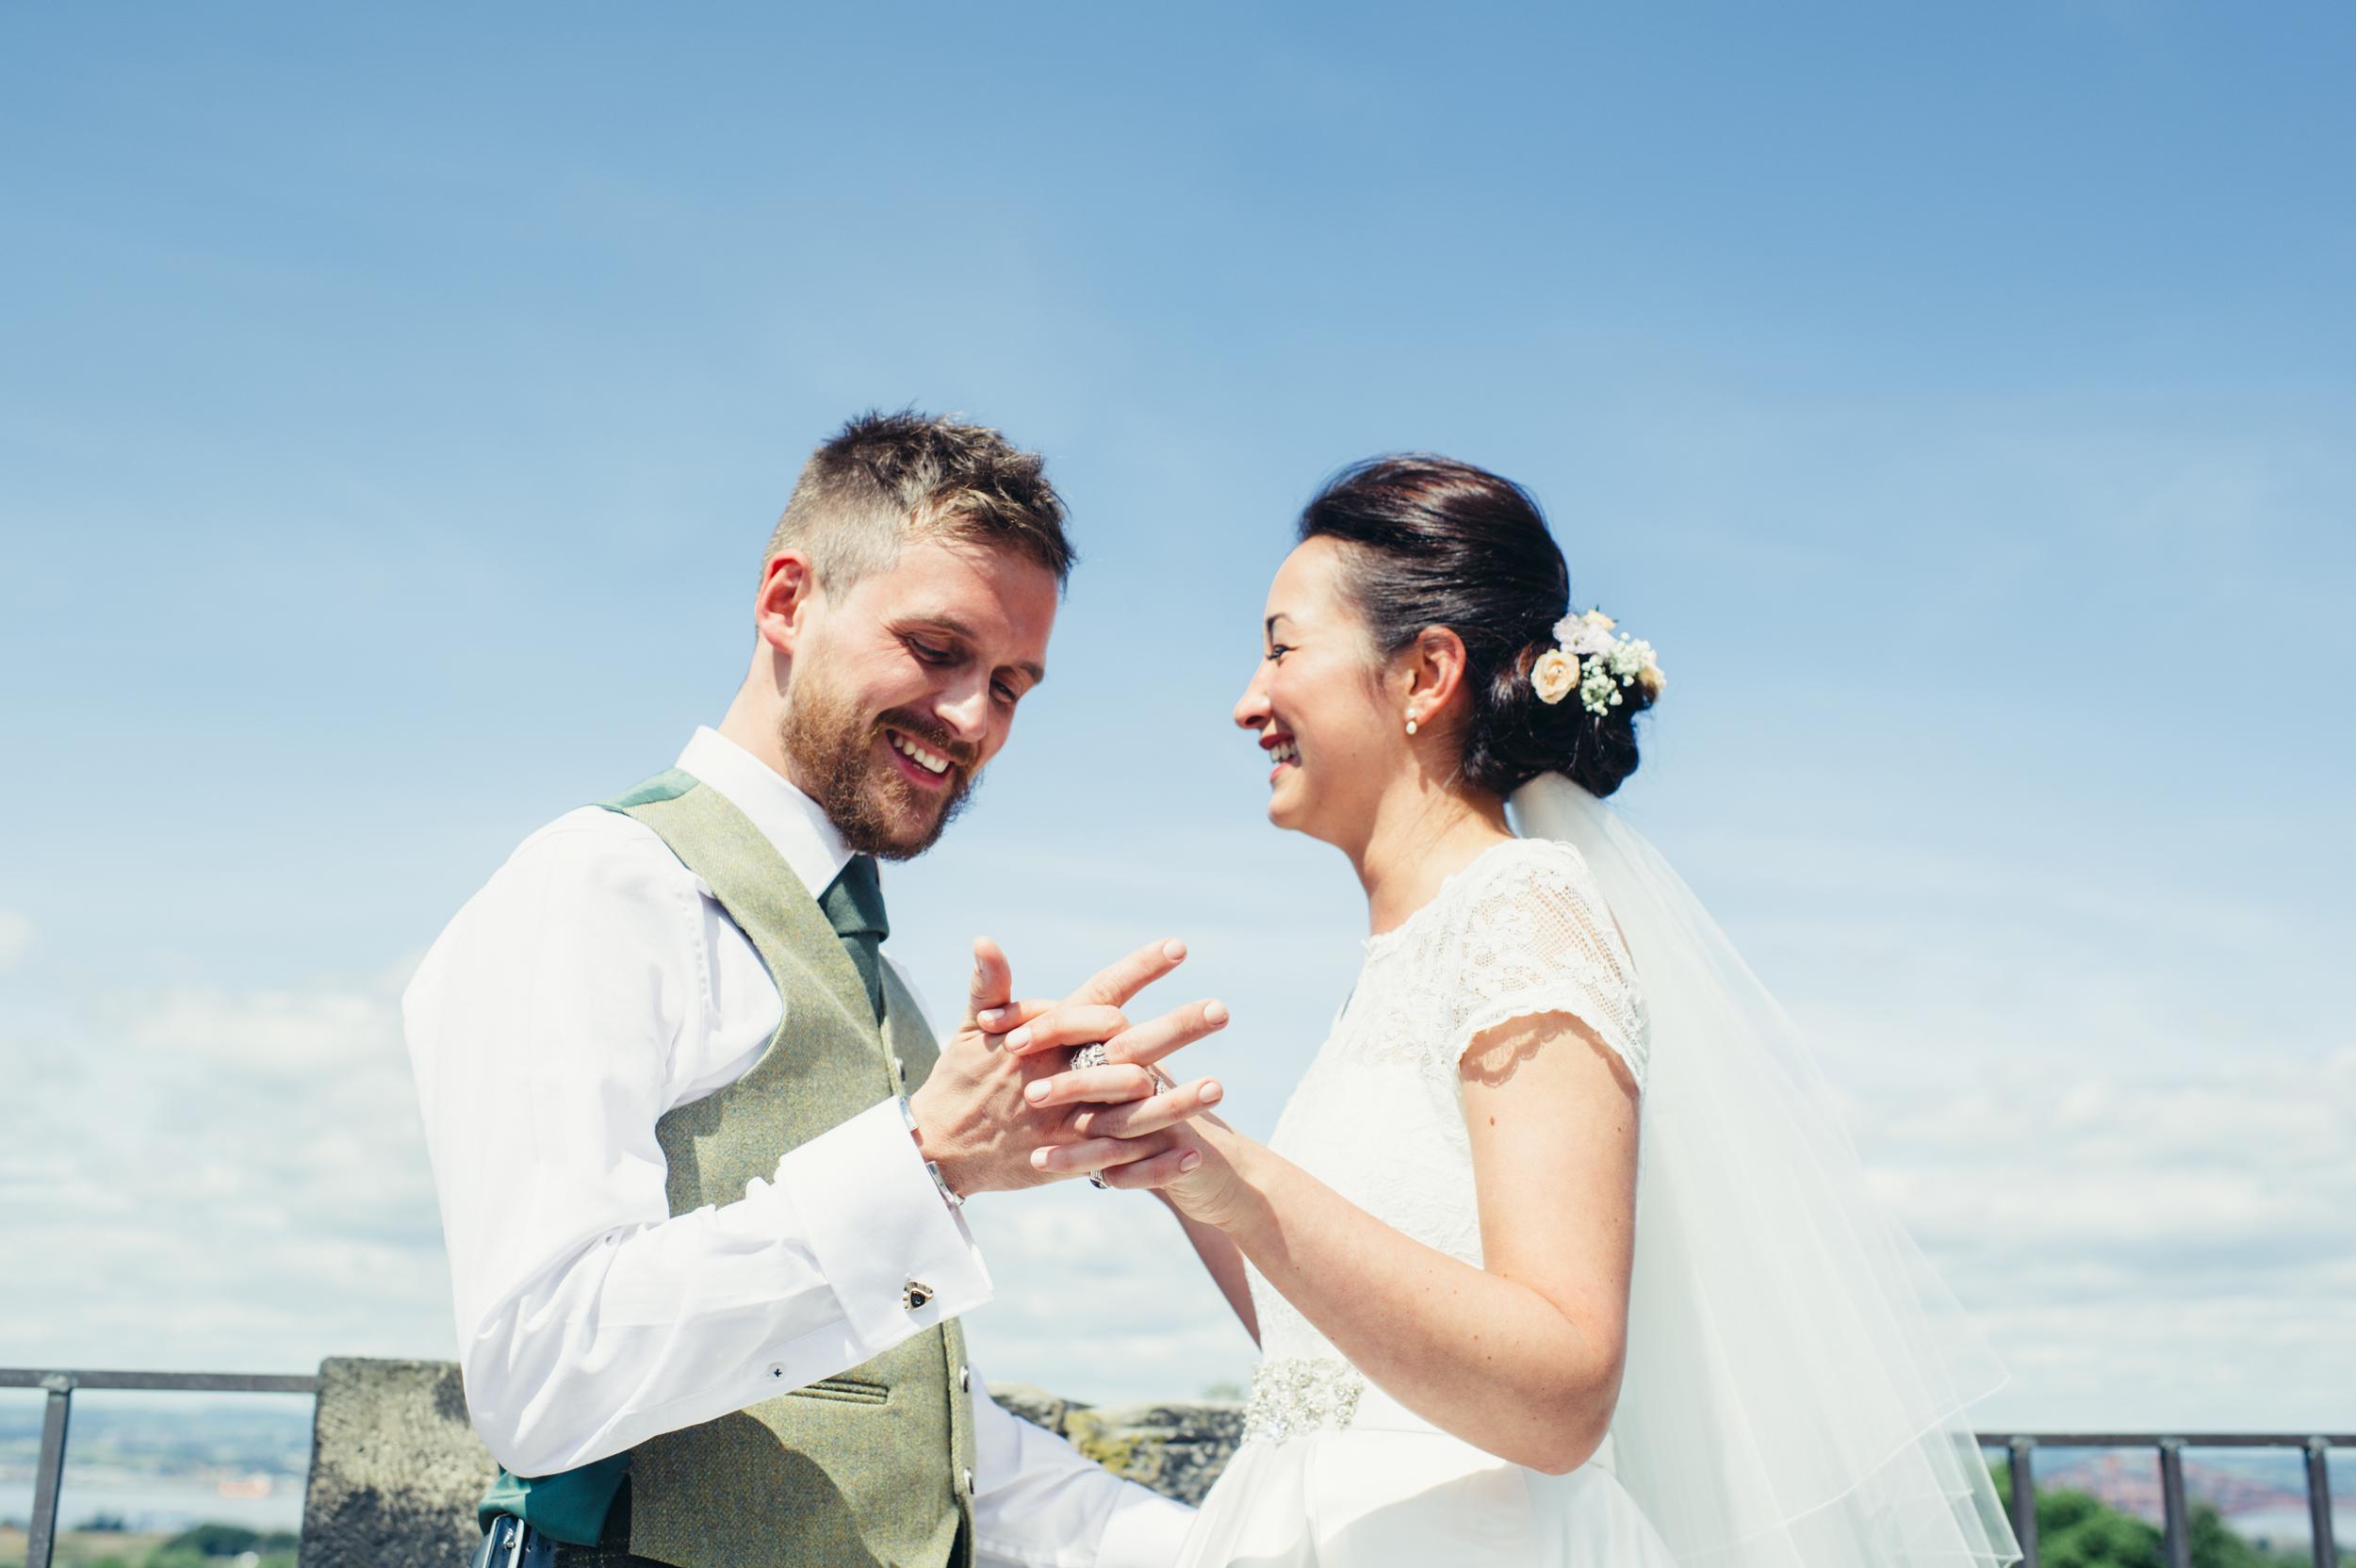 0112-lisa-devine-alternative-creative-wedding-photography-glasgow-edinburgh.JPG